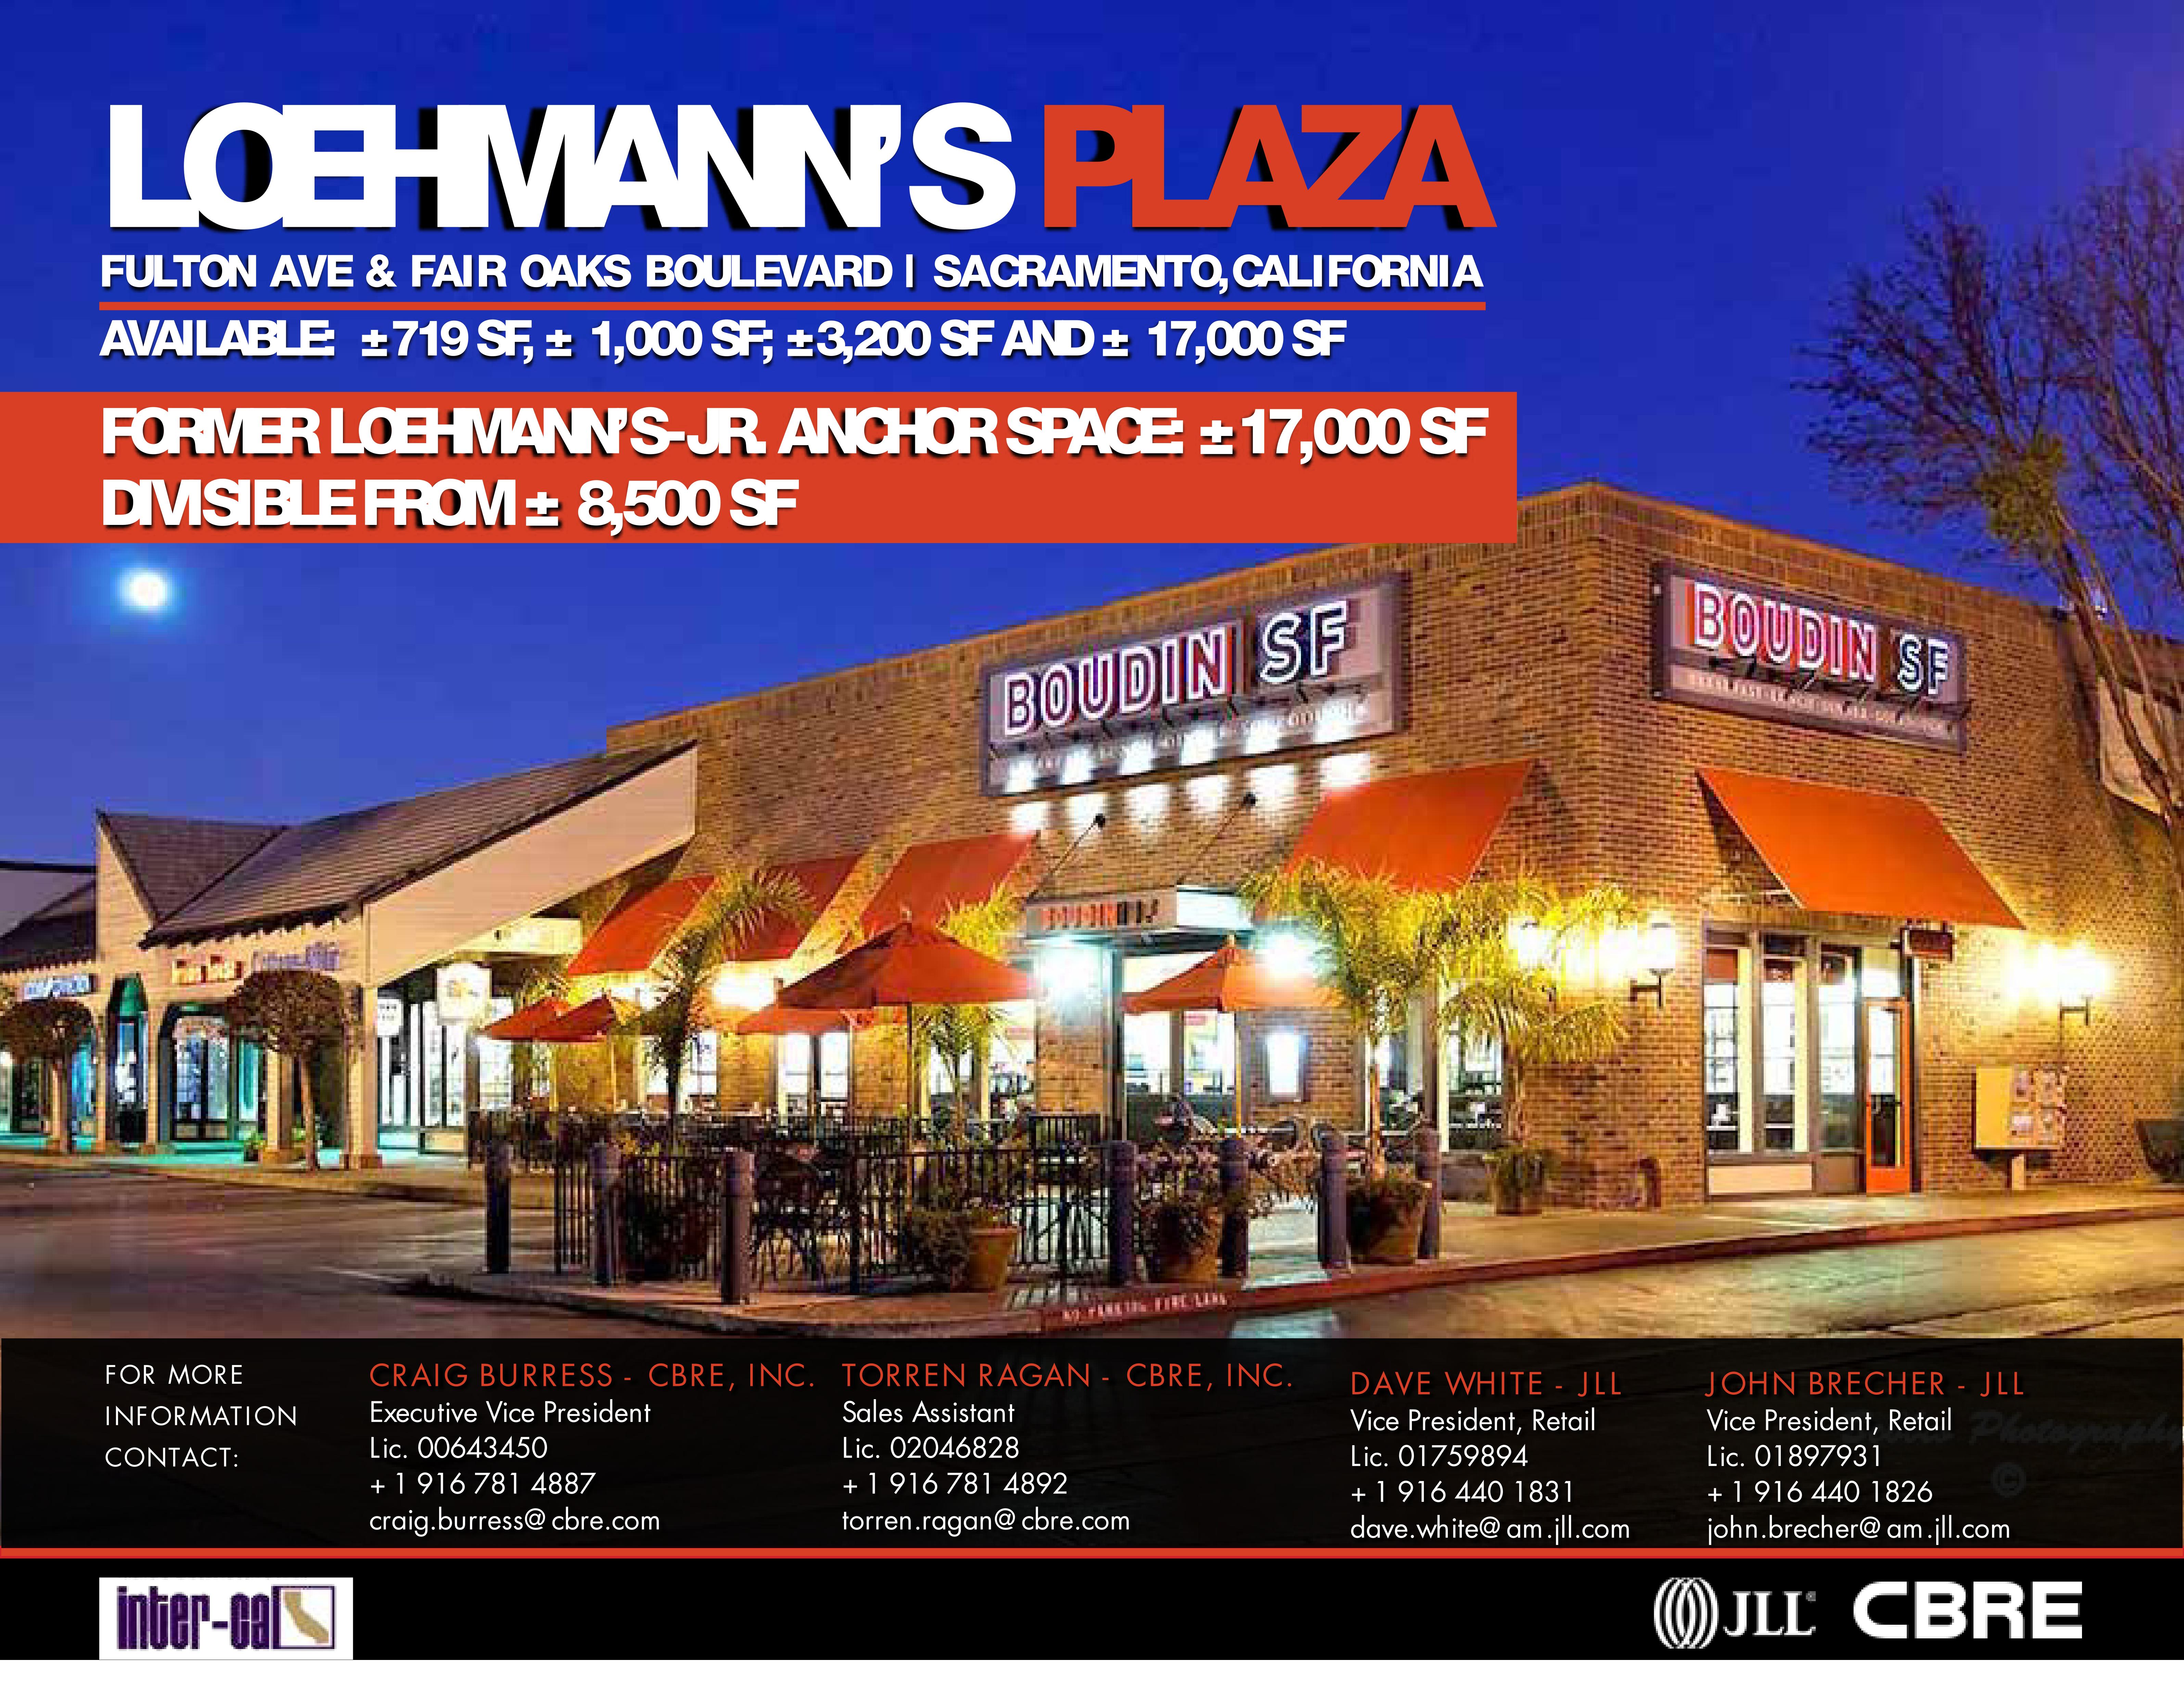 Loehmann's Plaza: site plan